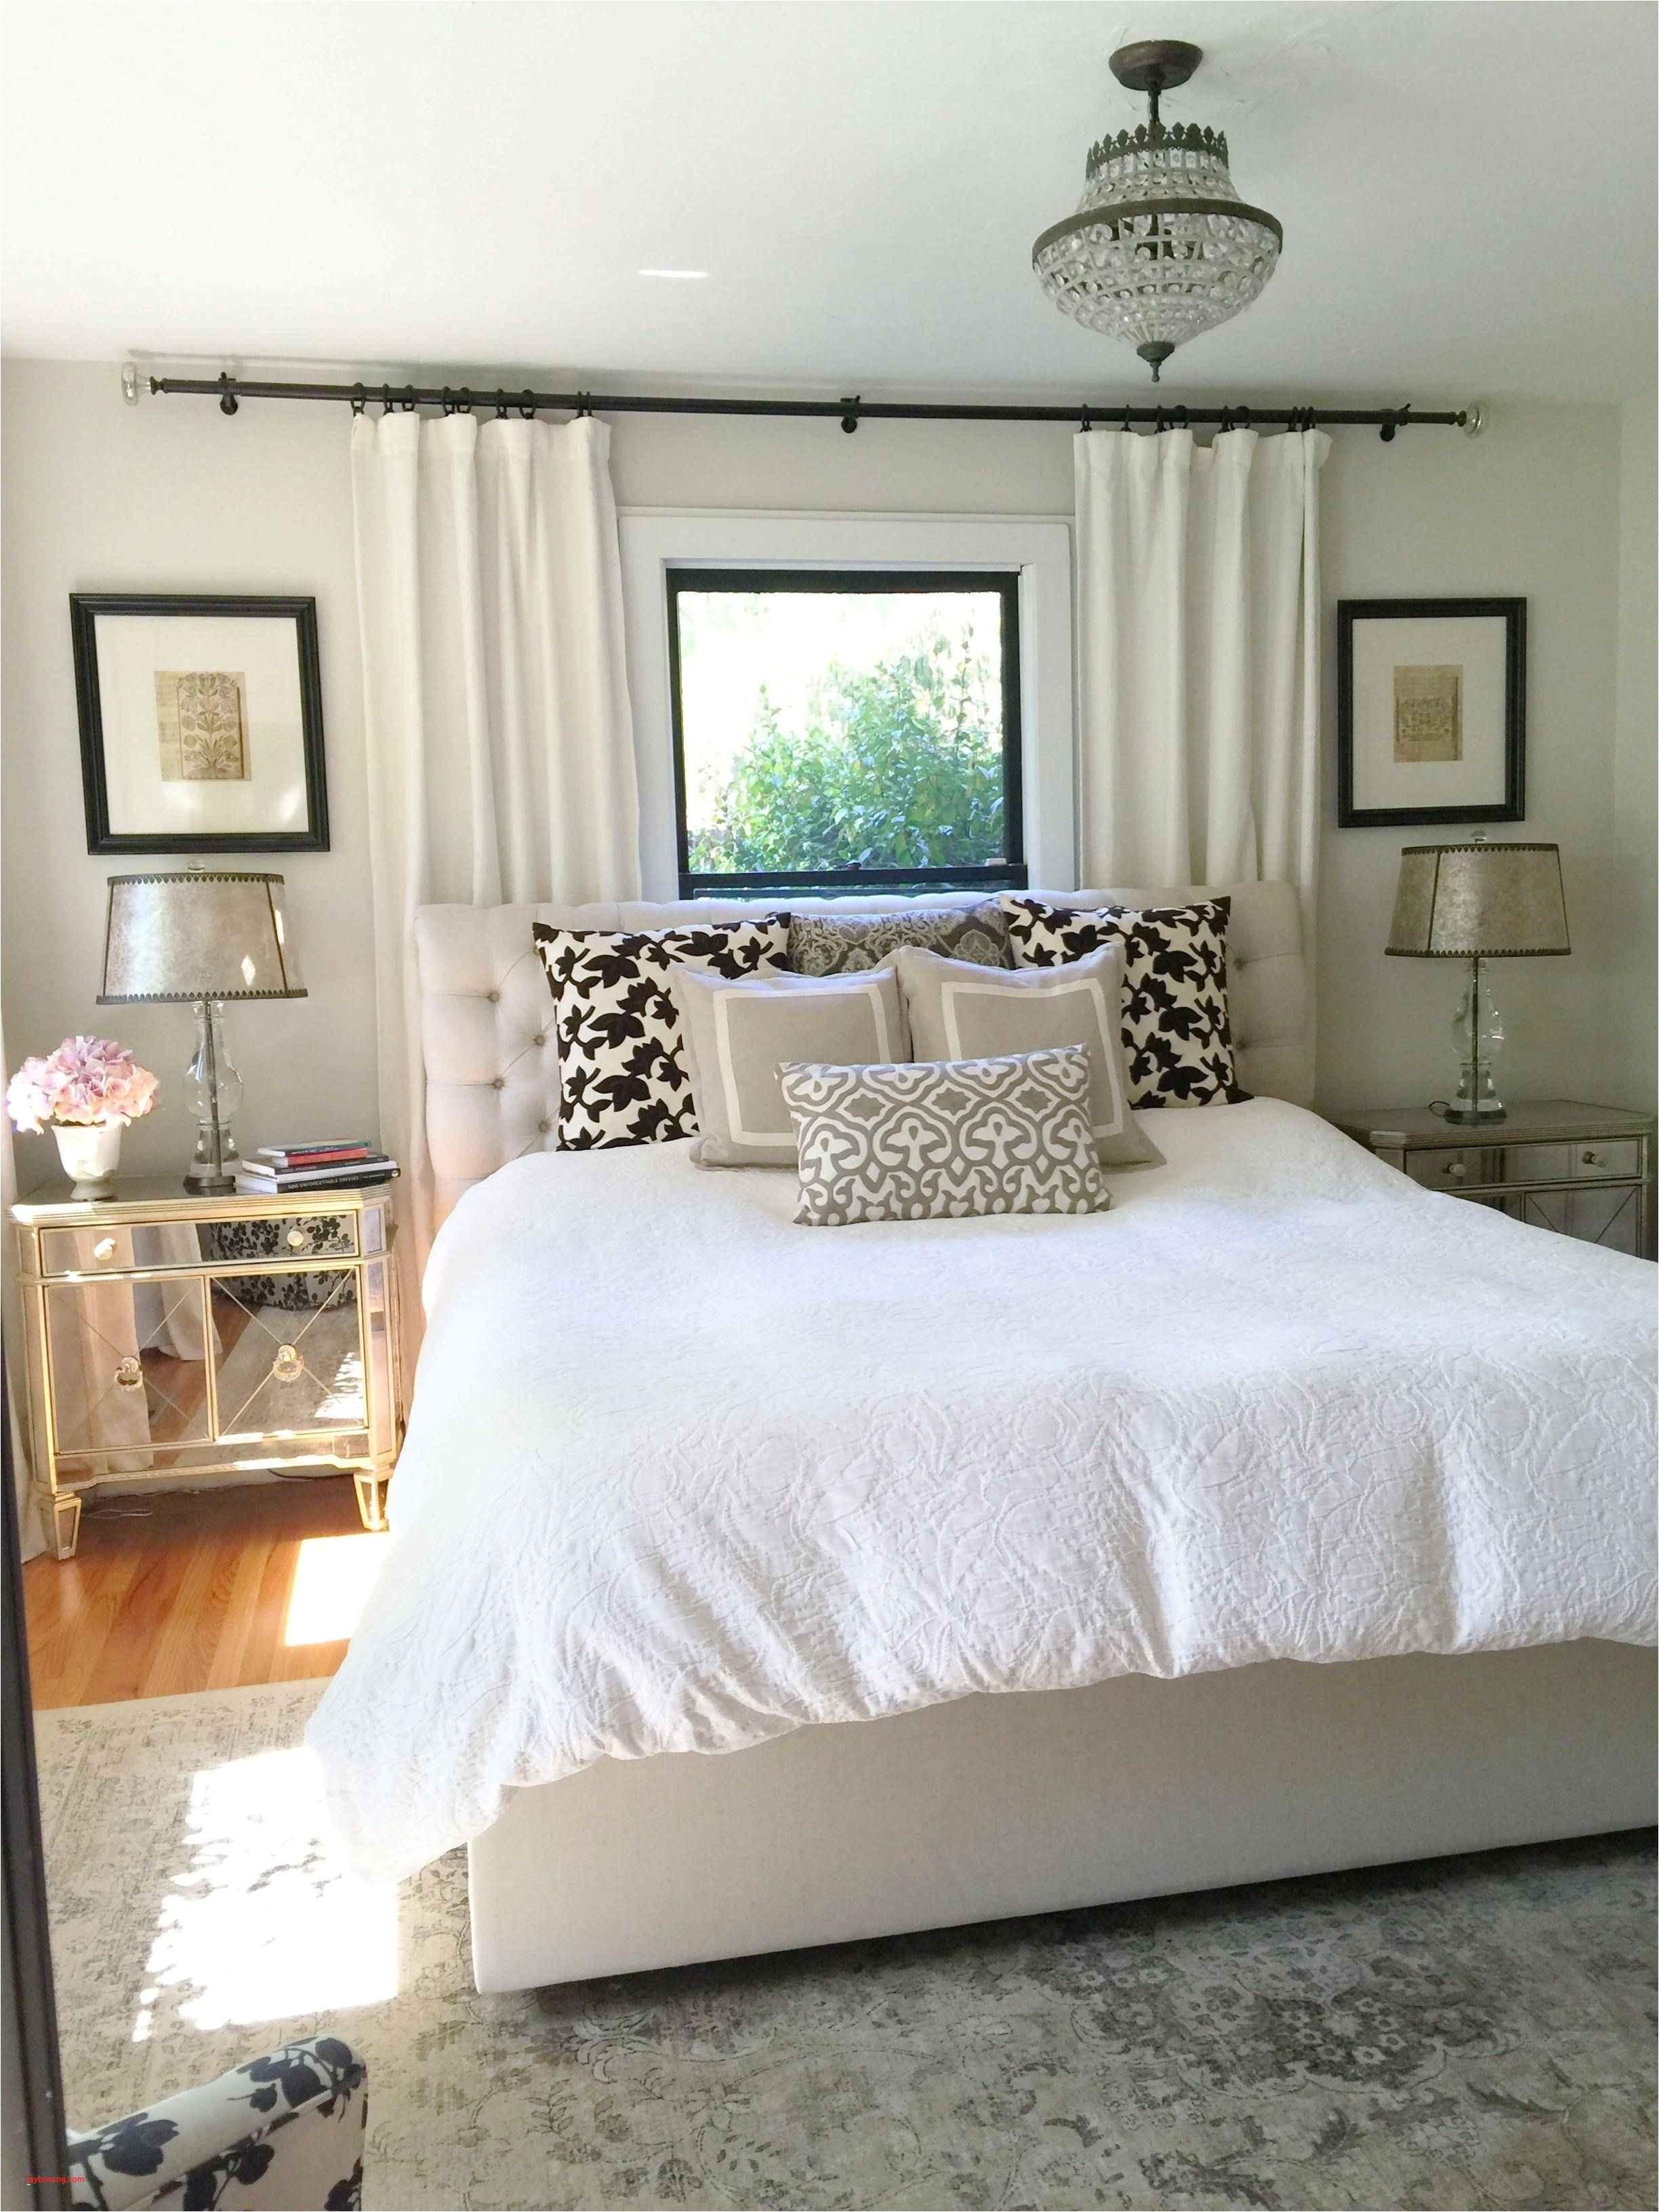 Wicker Bedroom Furniture New Graceful Cane Bedroom Furniture Uk Patio Furniture Covers Sale